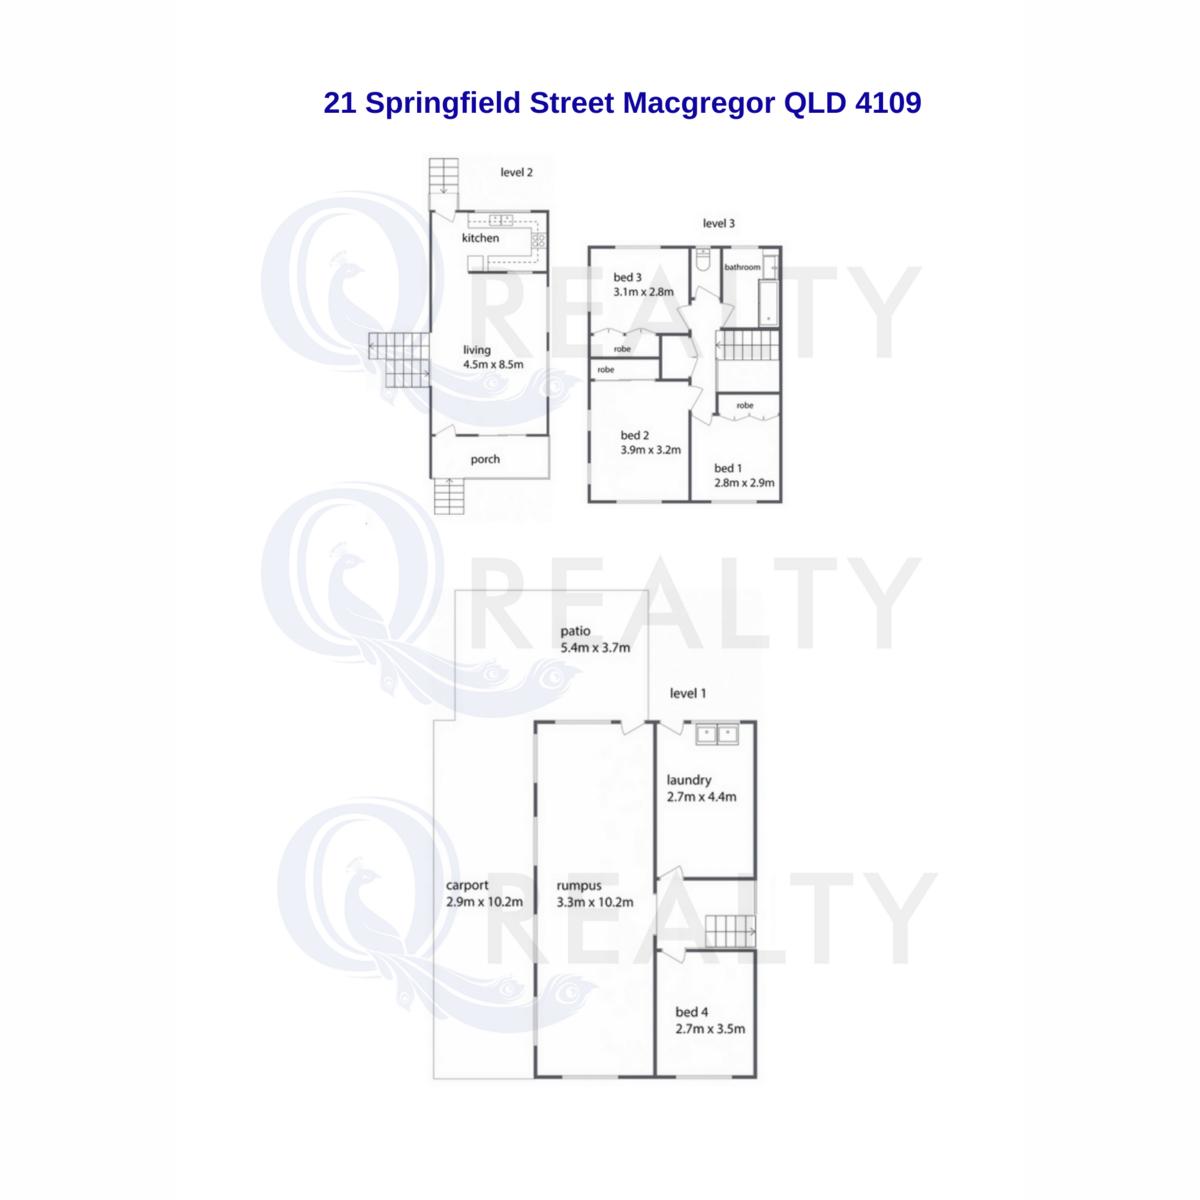 .21 Springfield Street, Macgregor  QLD  4109